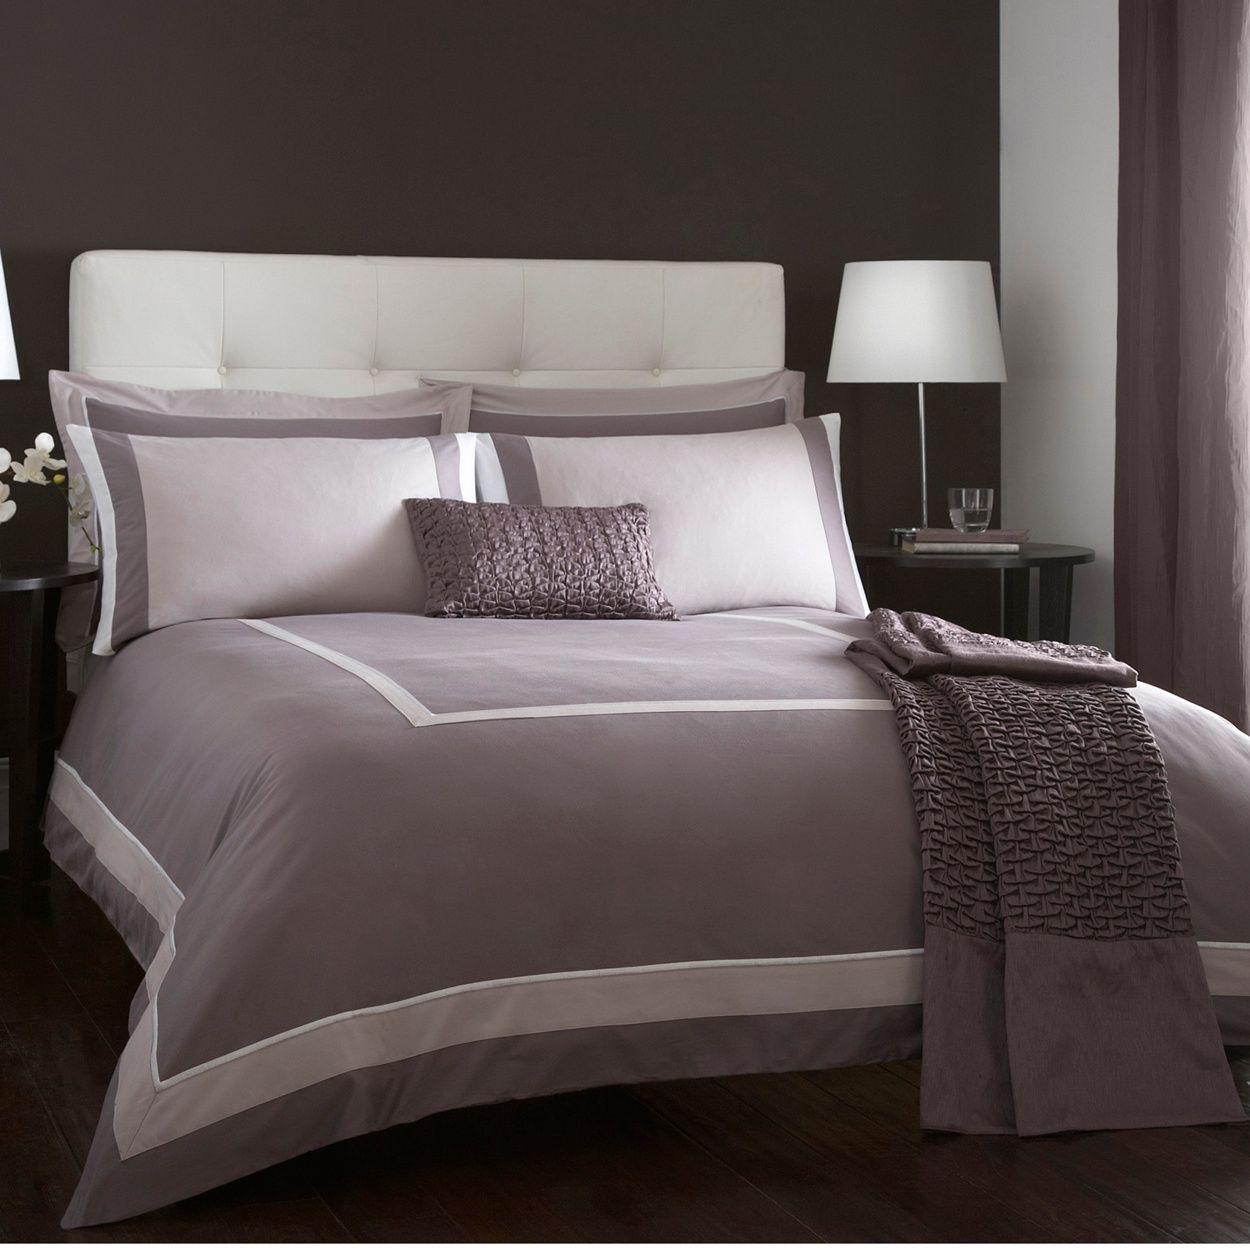 J By Jasper Conran Lilac Connaught Bed Linen At Debenhams Ie